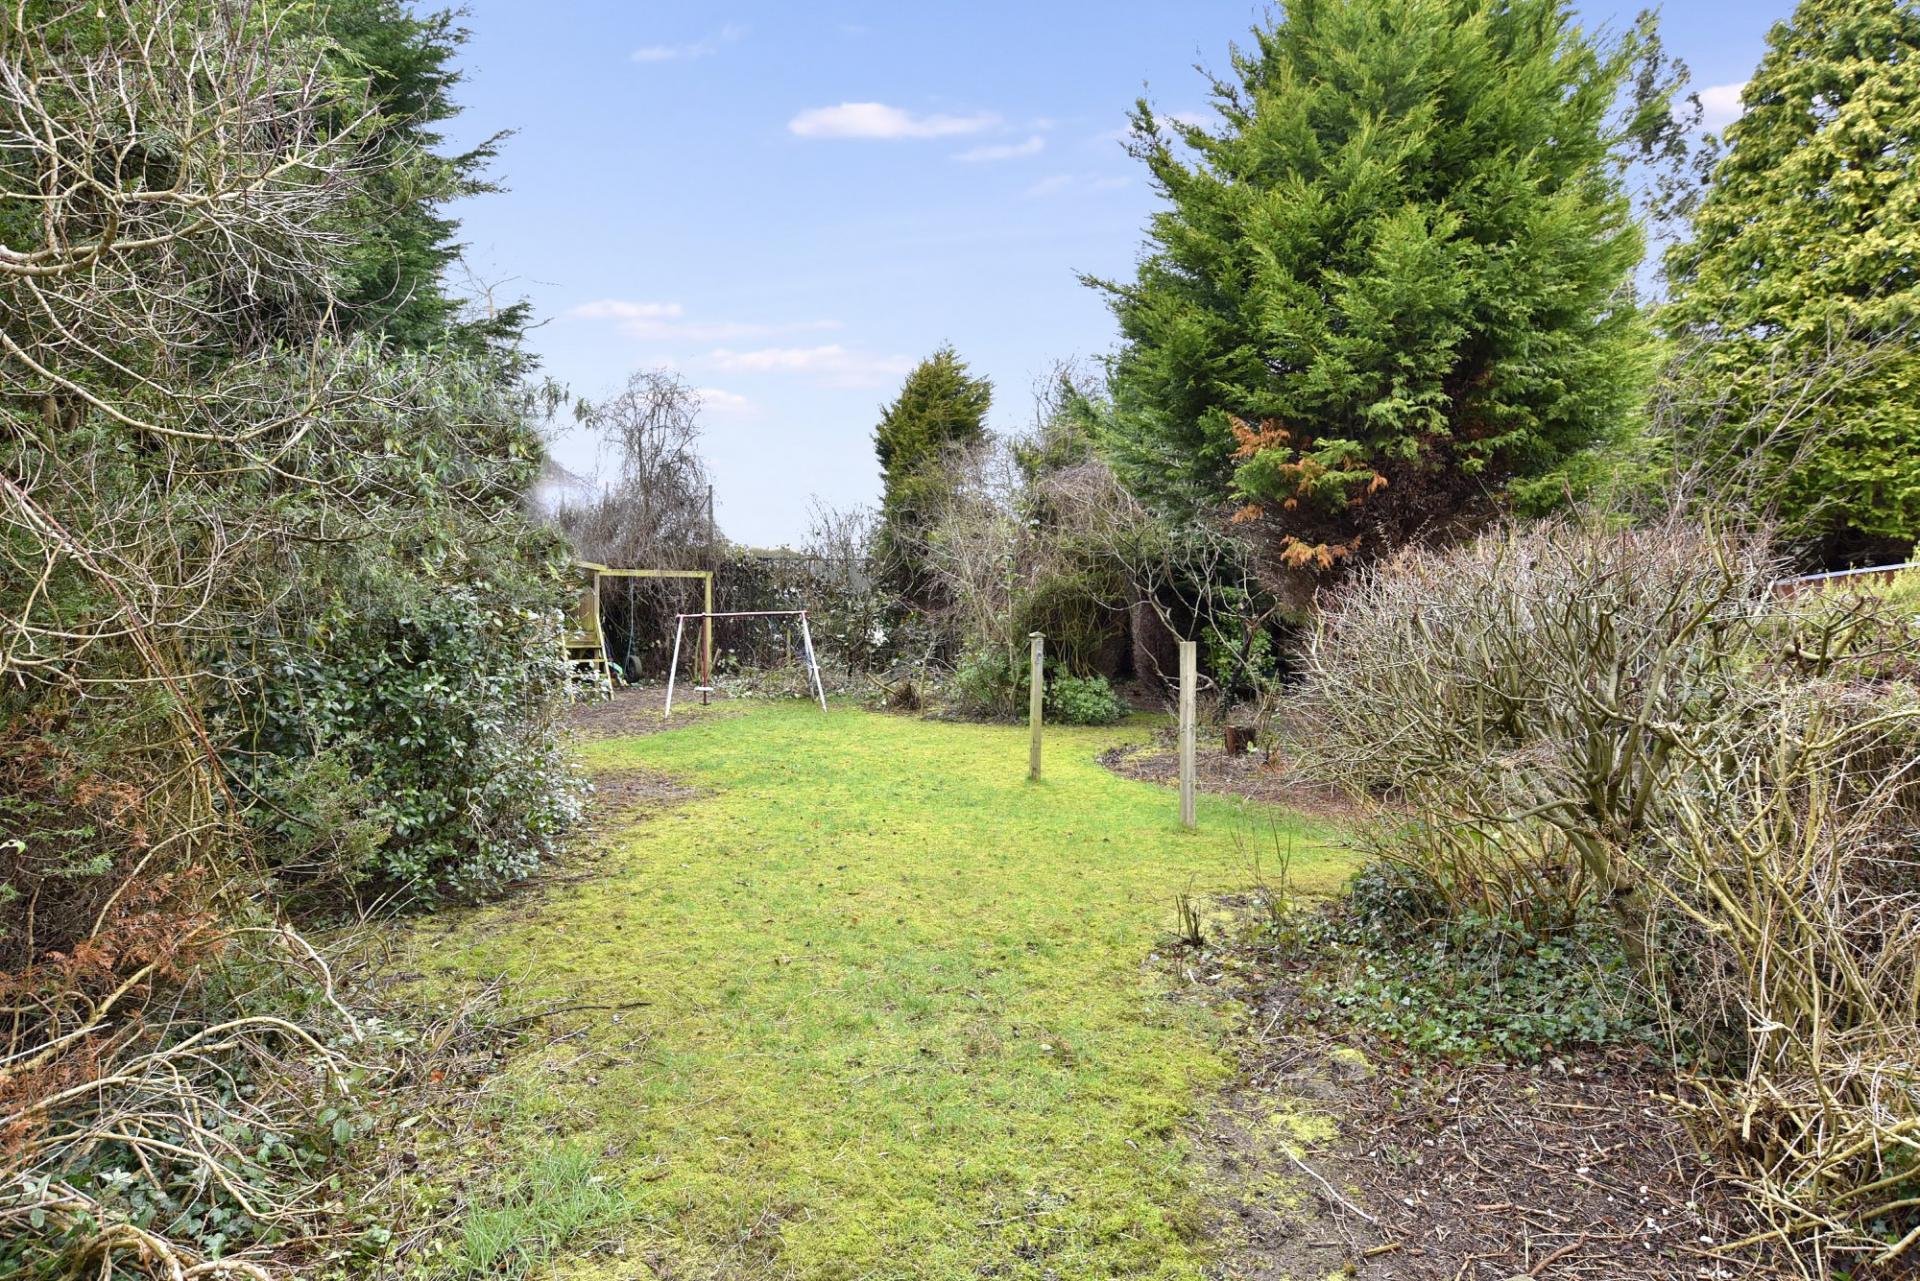 4 Bedroom Detached House For Sale In Harrogate